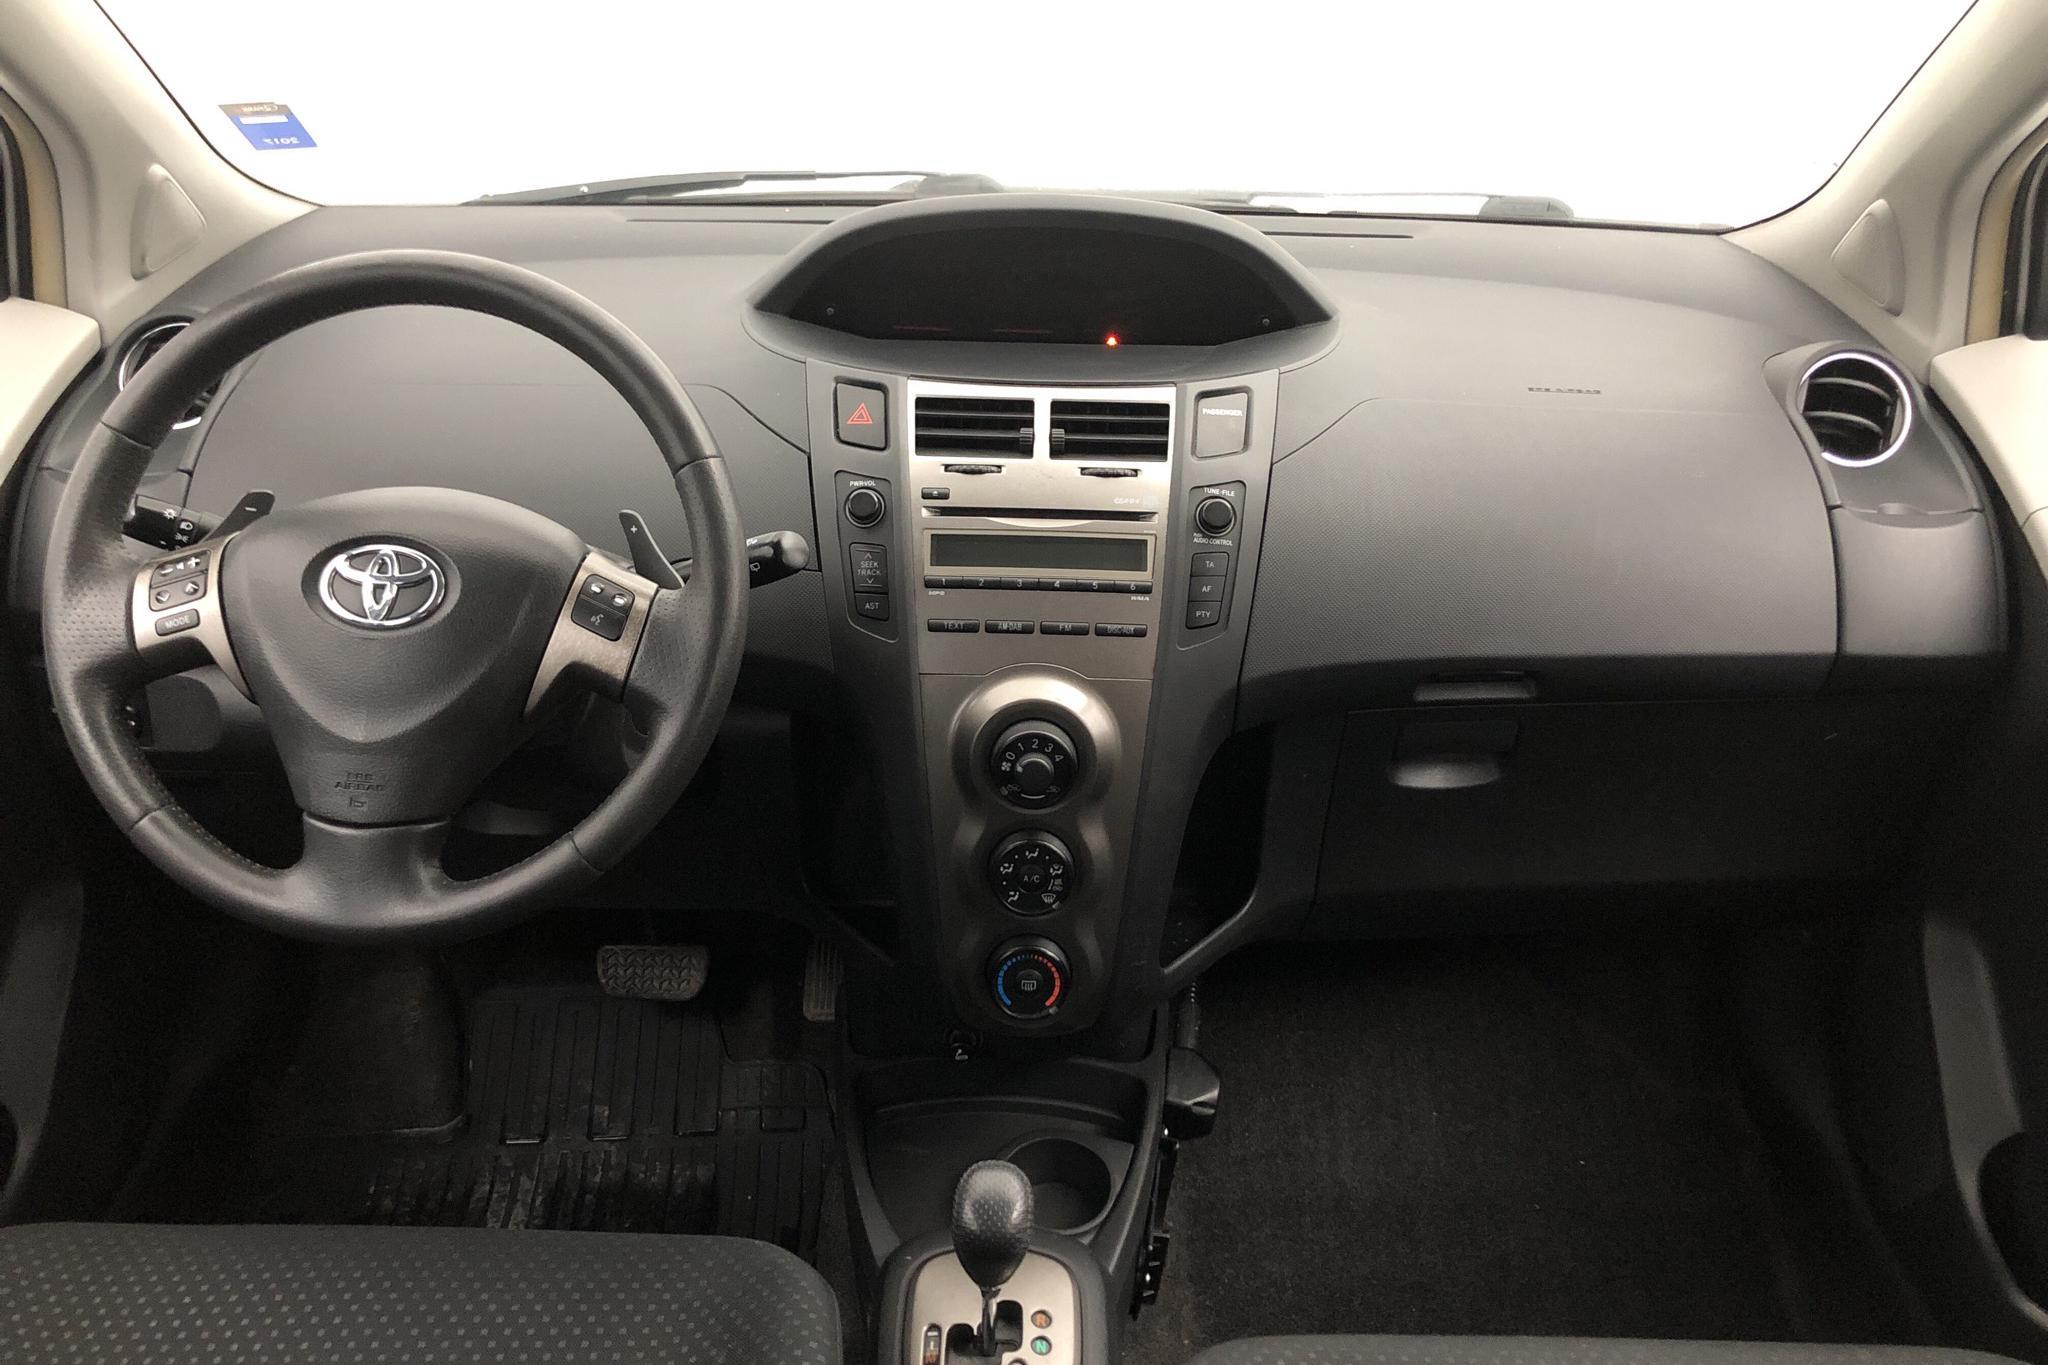 Toyota Yaris 1.33 5dr (100hk) - 90 250 km - Automatic - silver - 2010